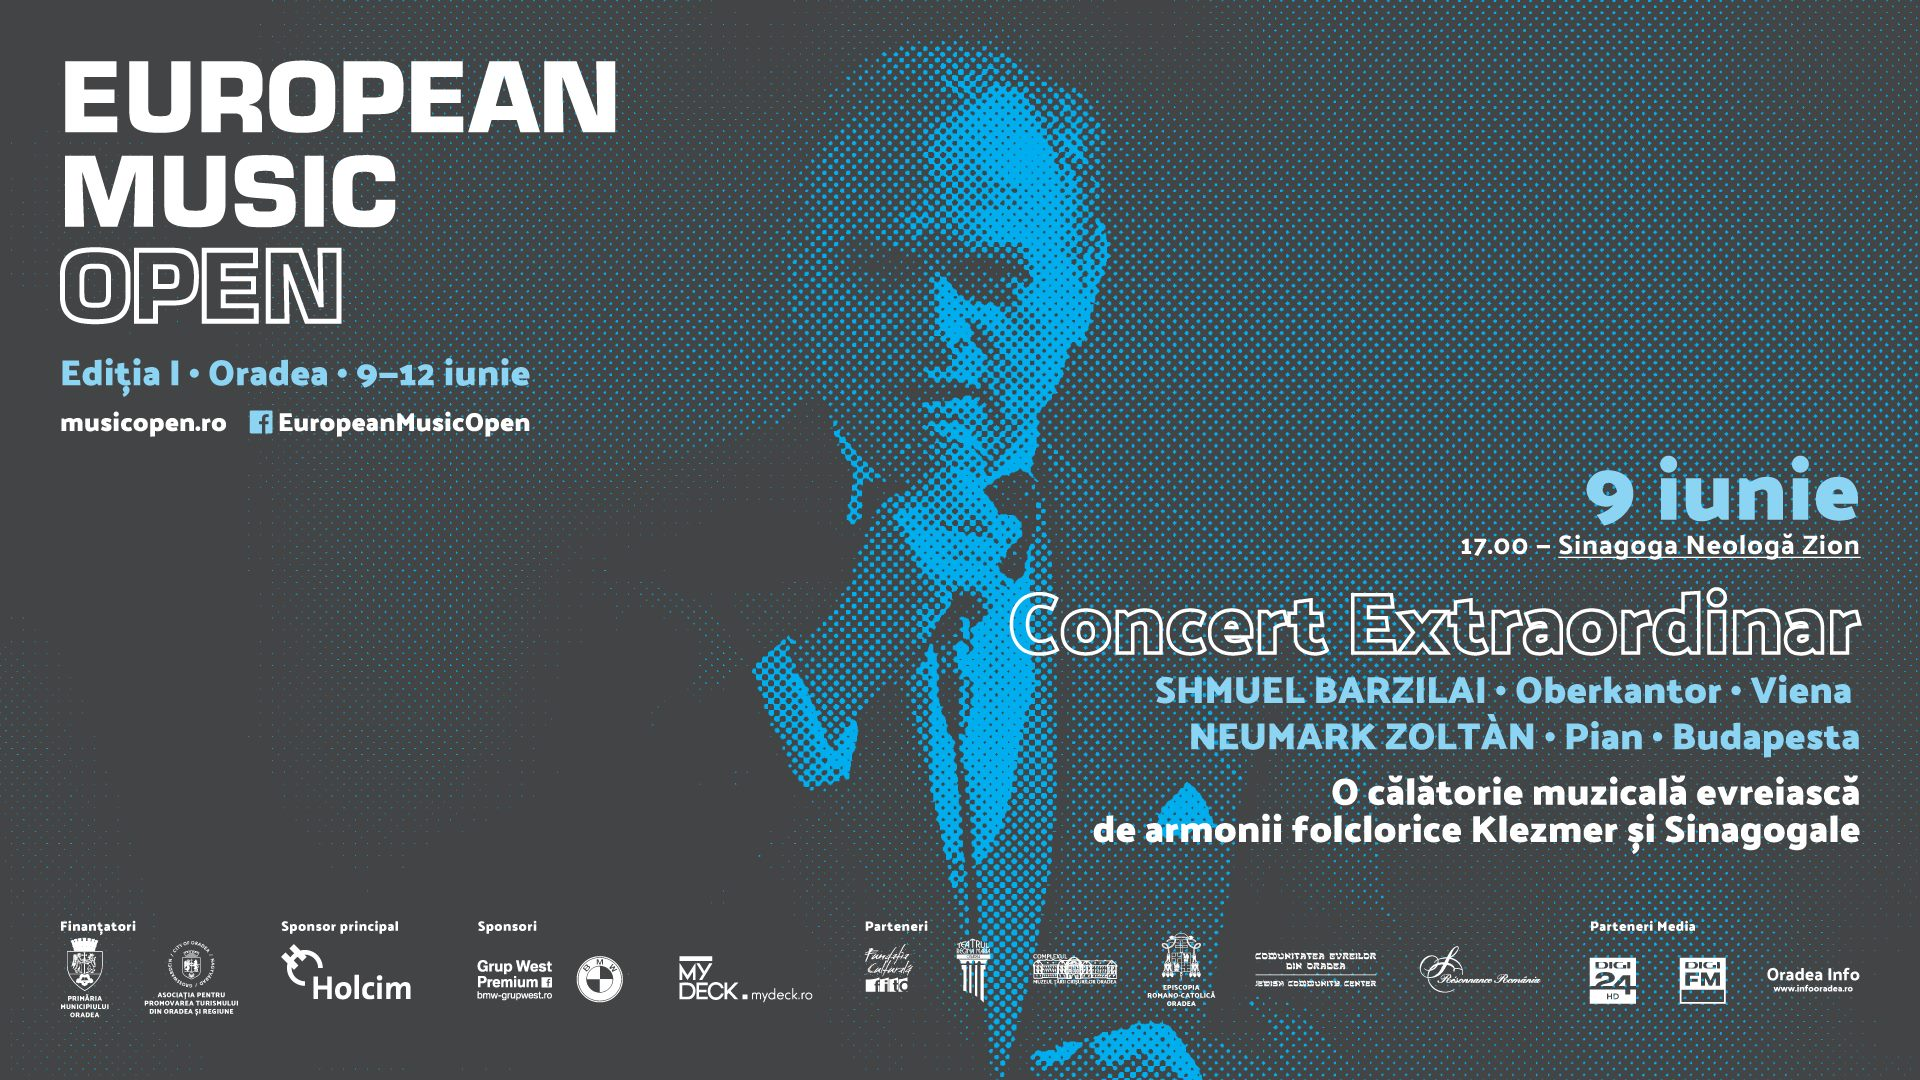 European Music Open 2016